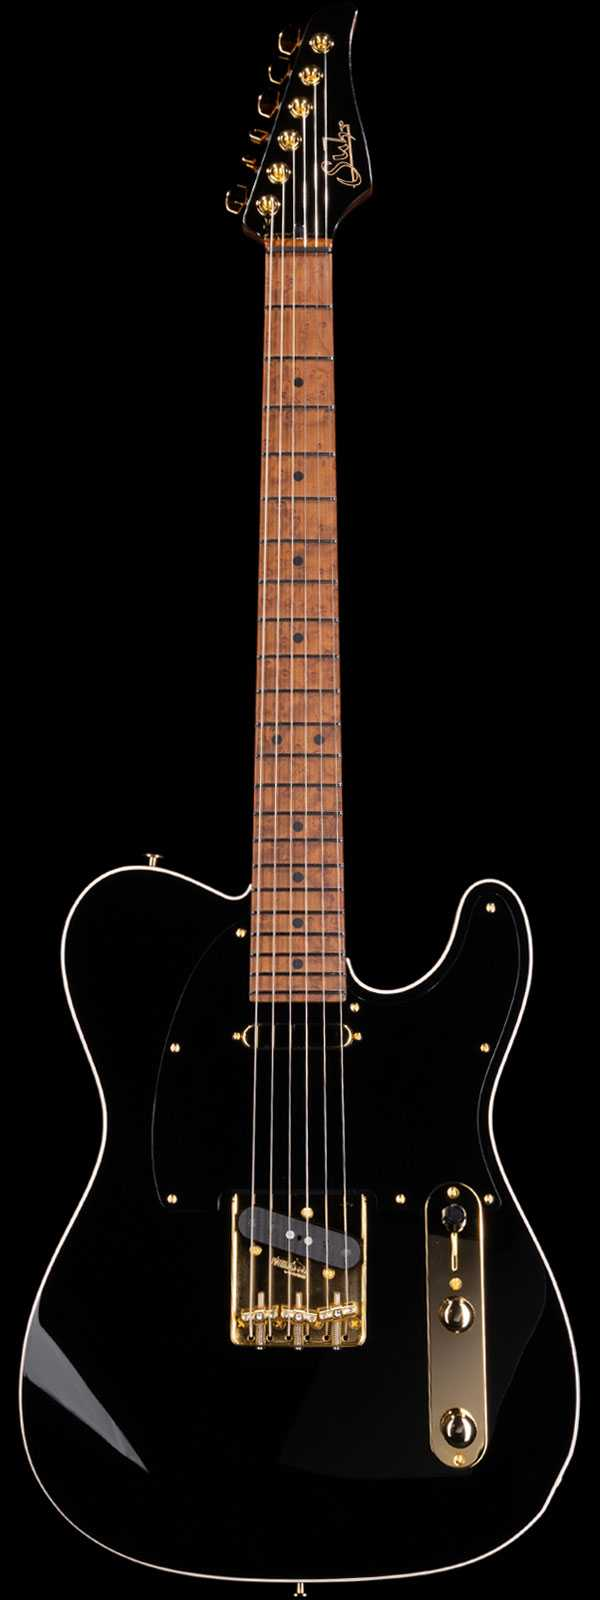 Suhr Mateus Asato Signature Standard Classic T Roasted Birdseye Maple Board Black